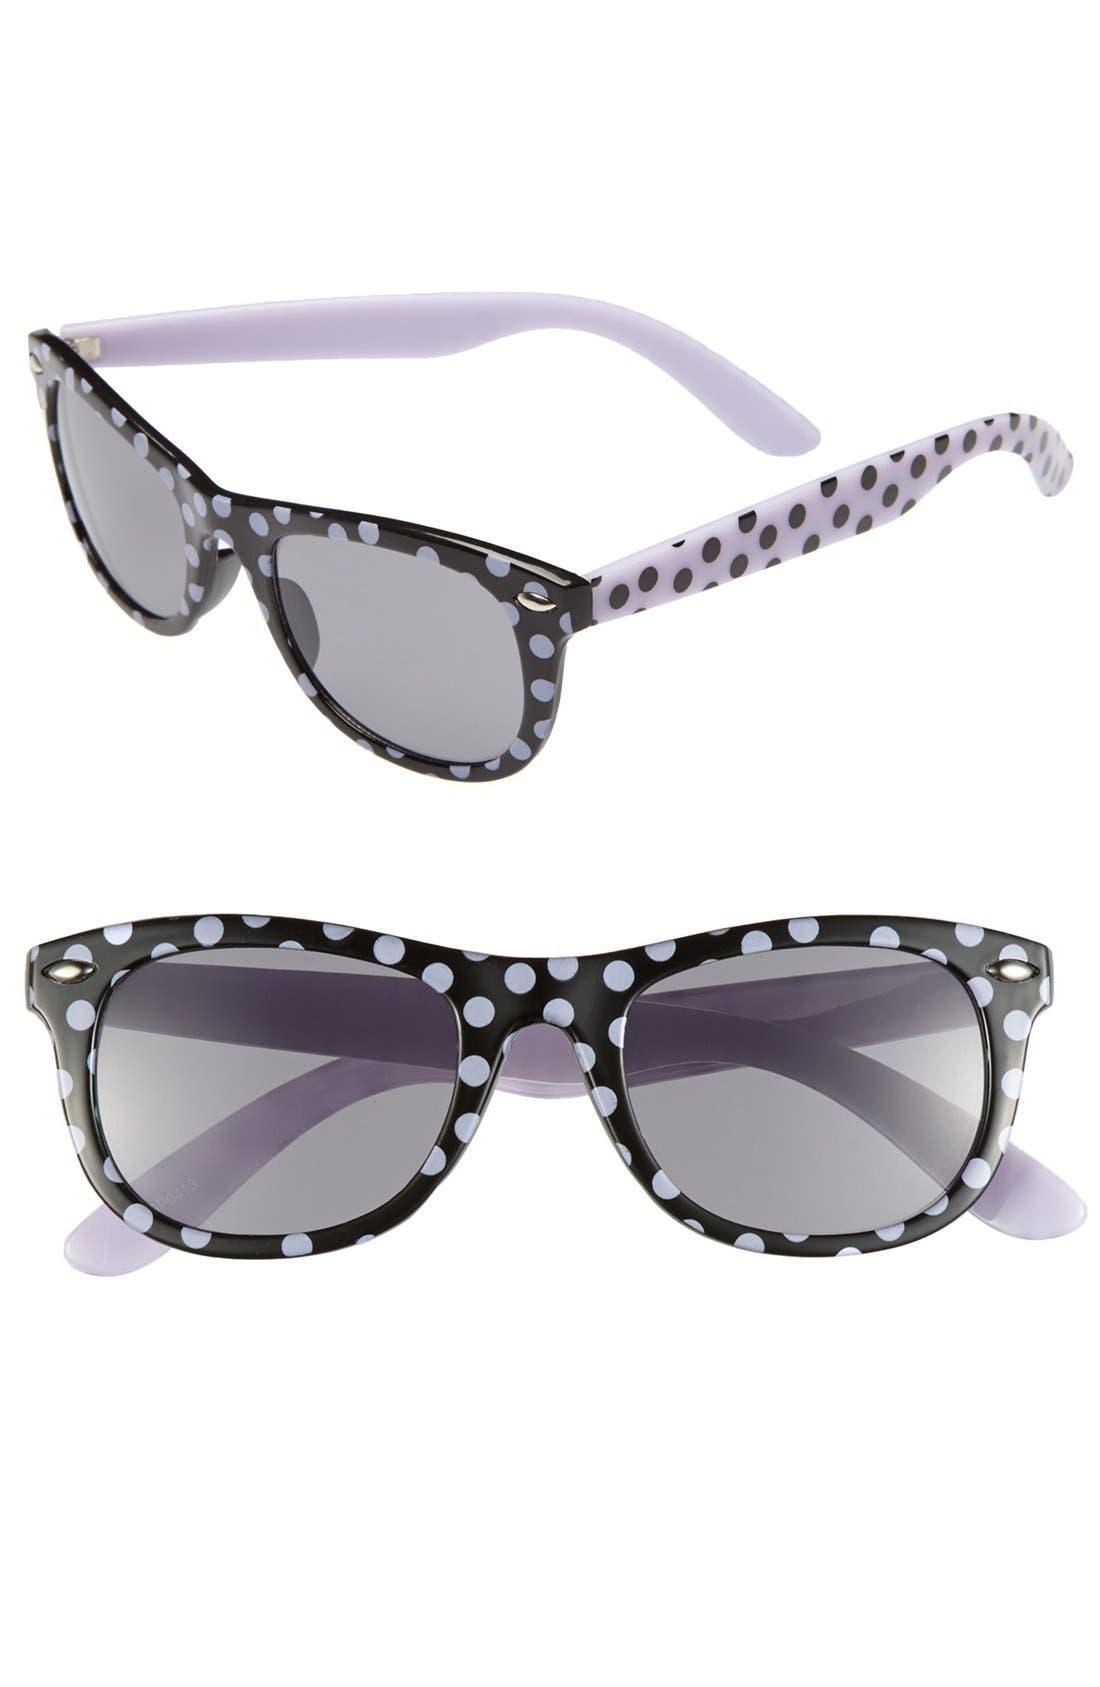 Main Image - Fantas Eyes Print Sunglasses (Girls)